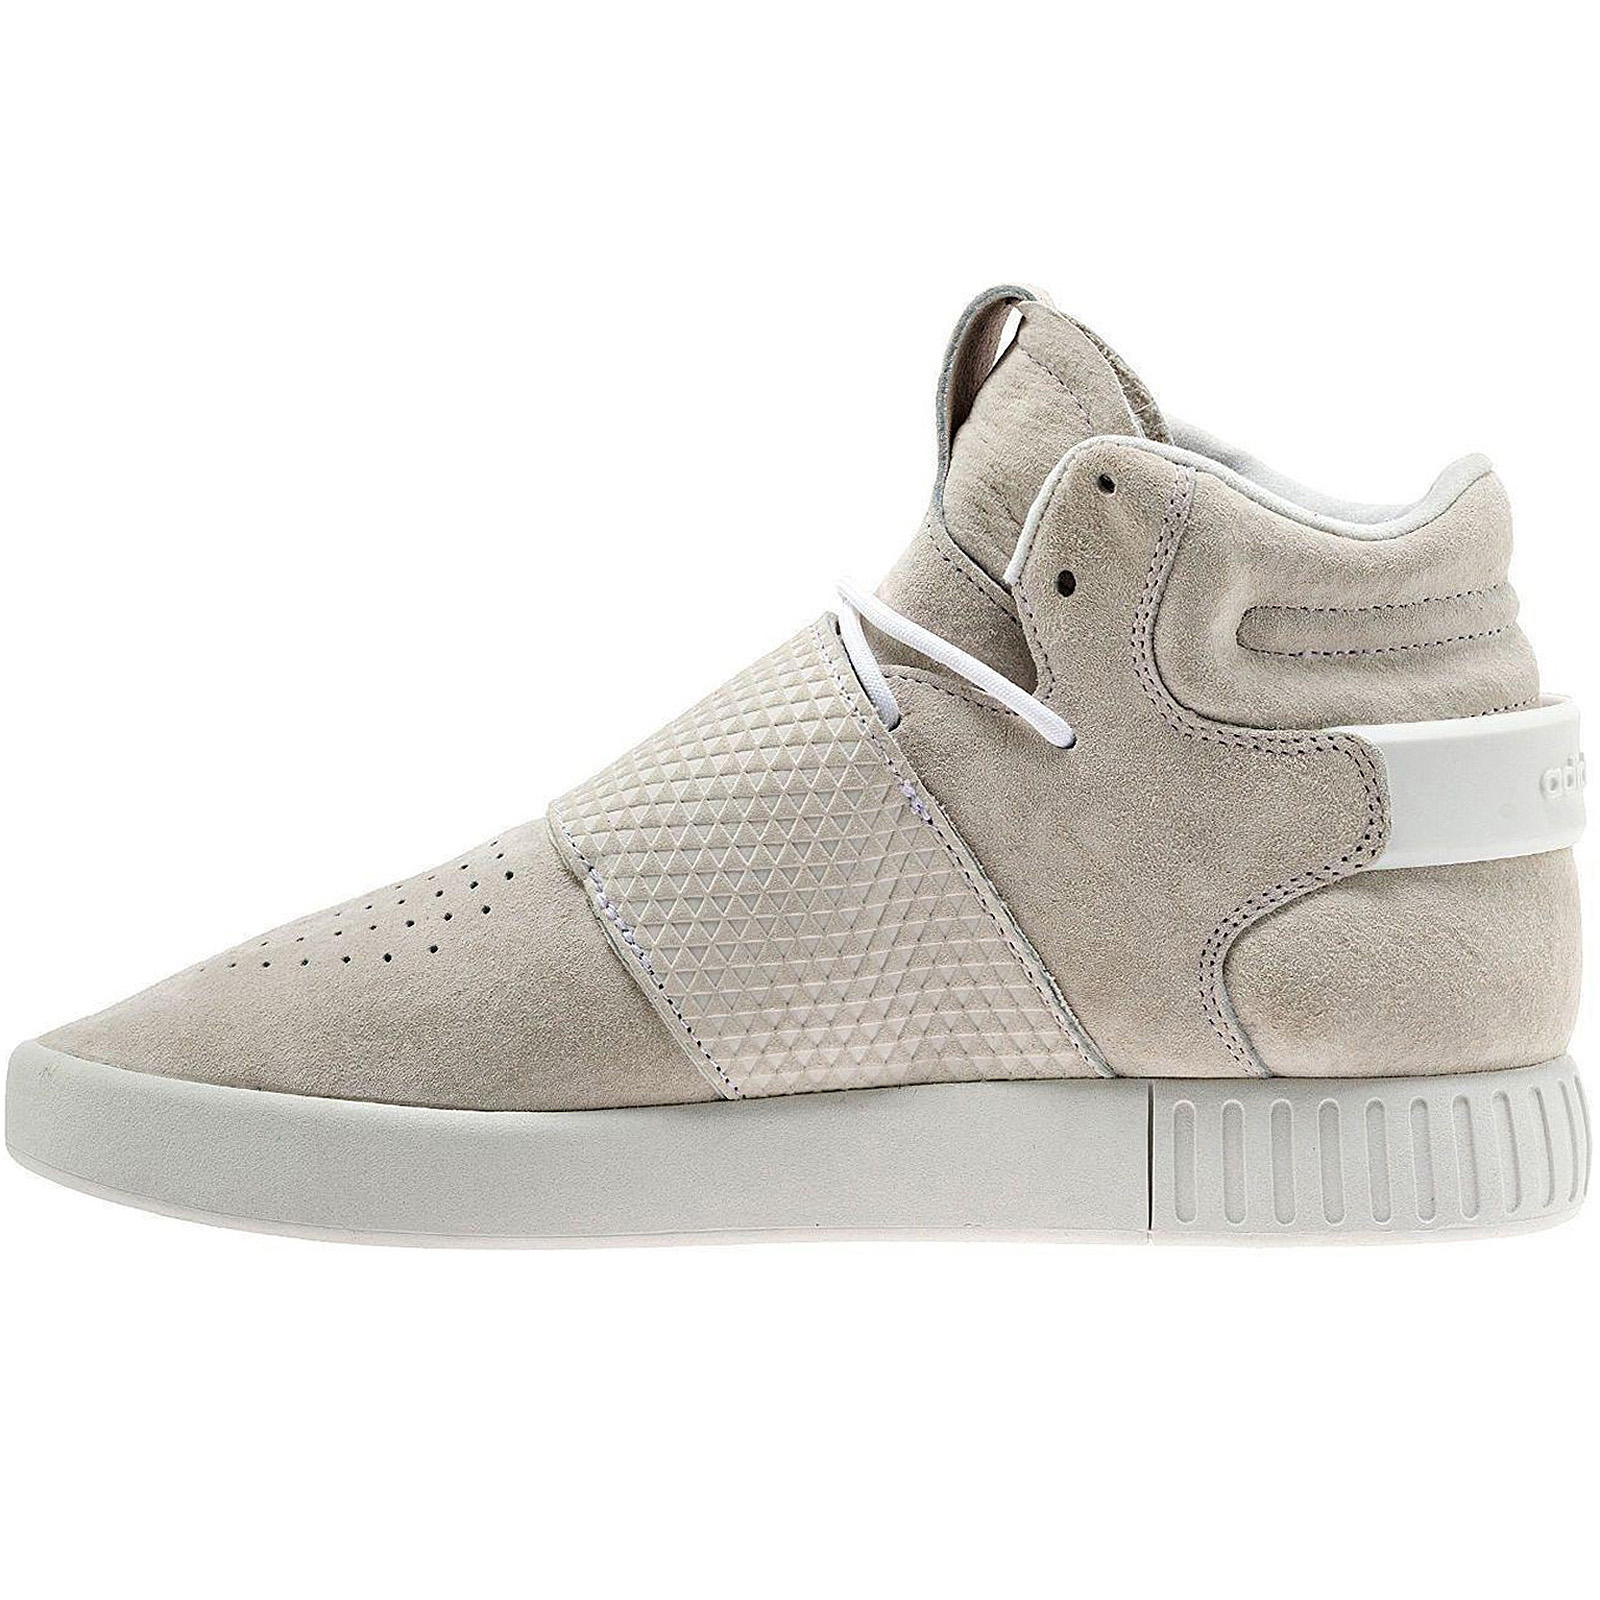 adidas-Originals-Mens-Tubular-Invader-Strap-Casual-Lace-Up-Hi-Top-Trainers-Shoes thumbnail 23